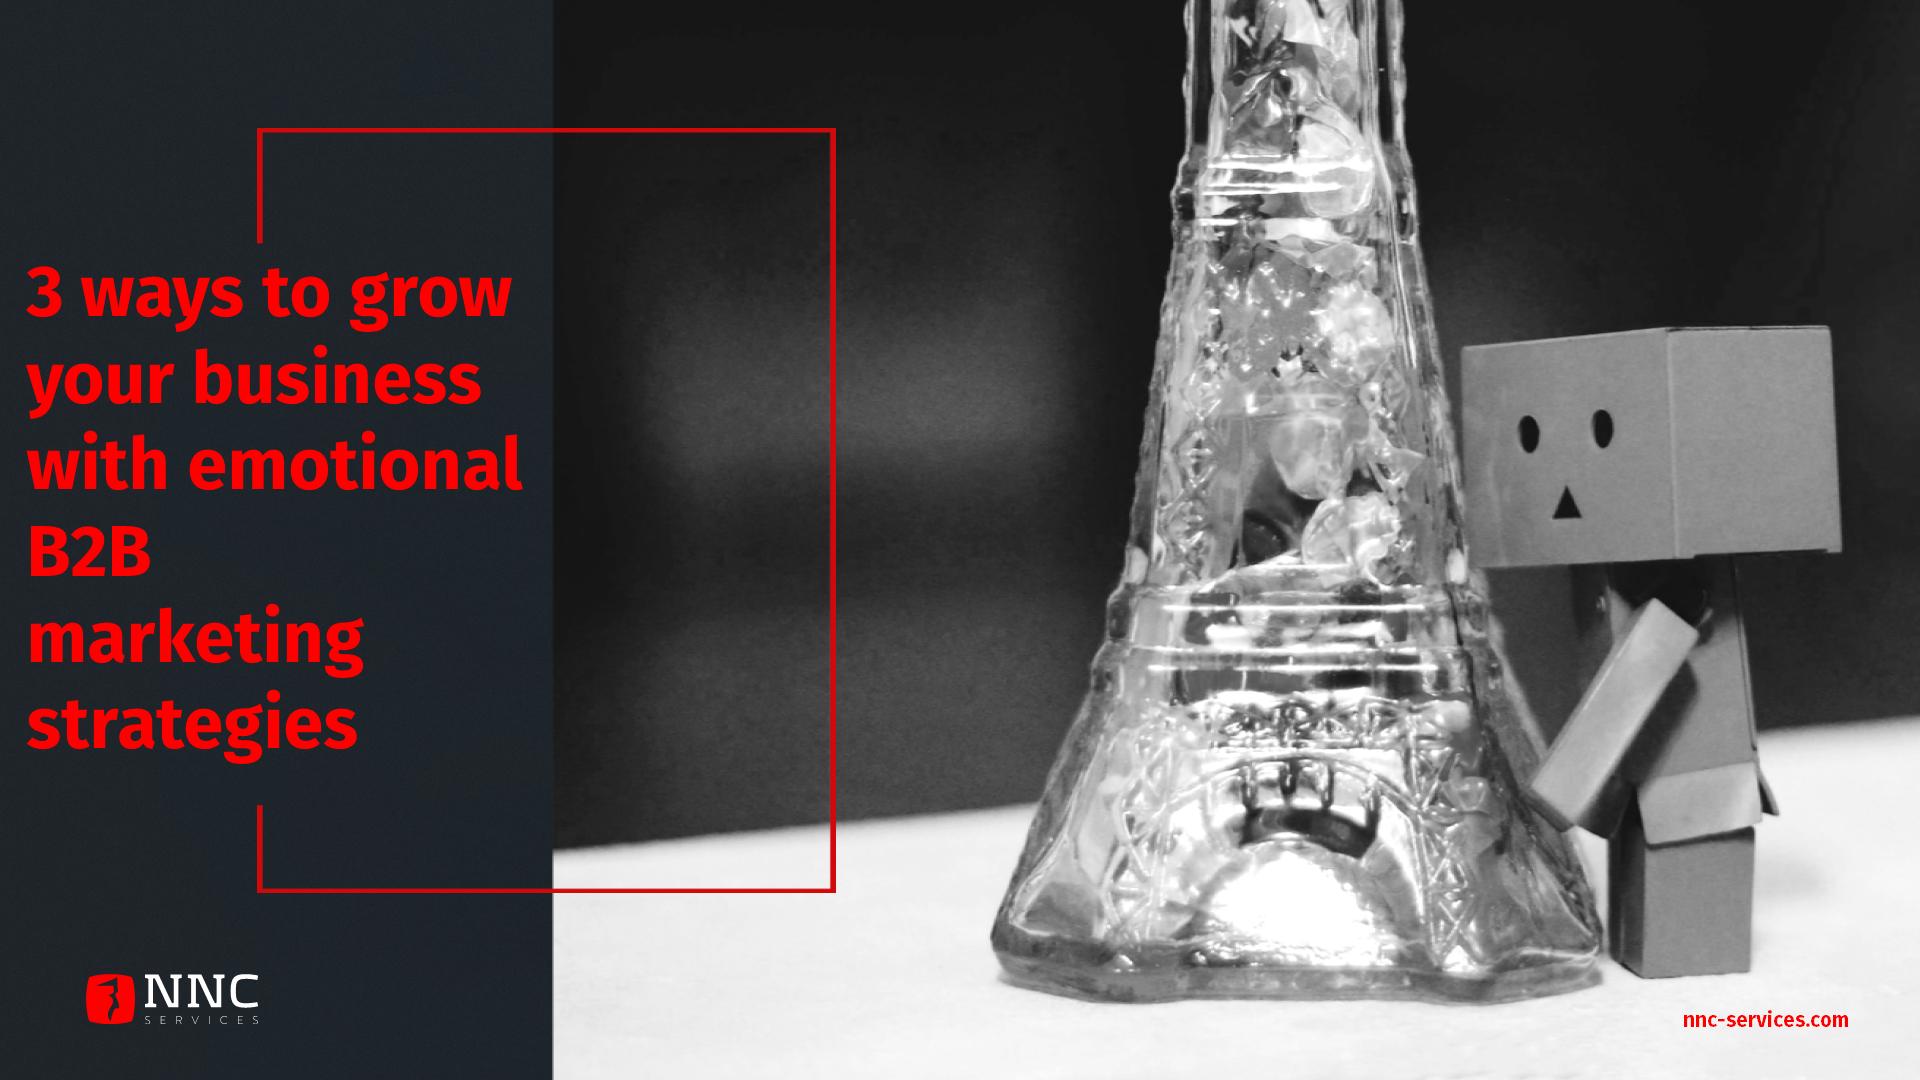 NNC Emotional B2B Marketing strategies help your business grow